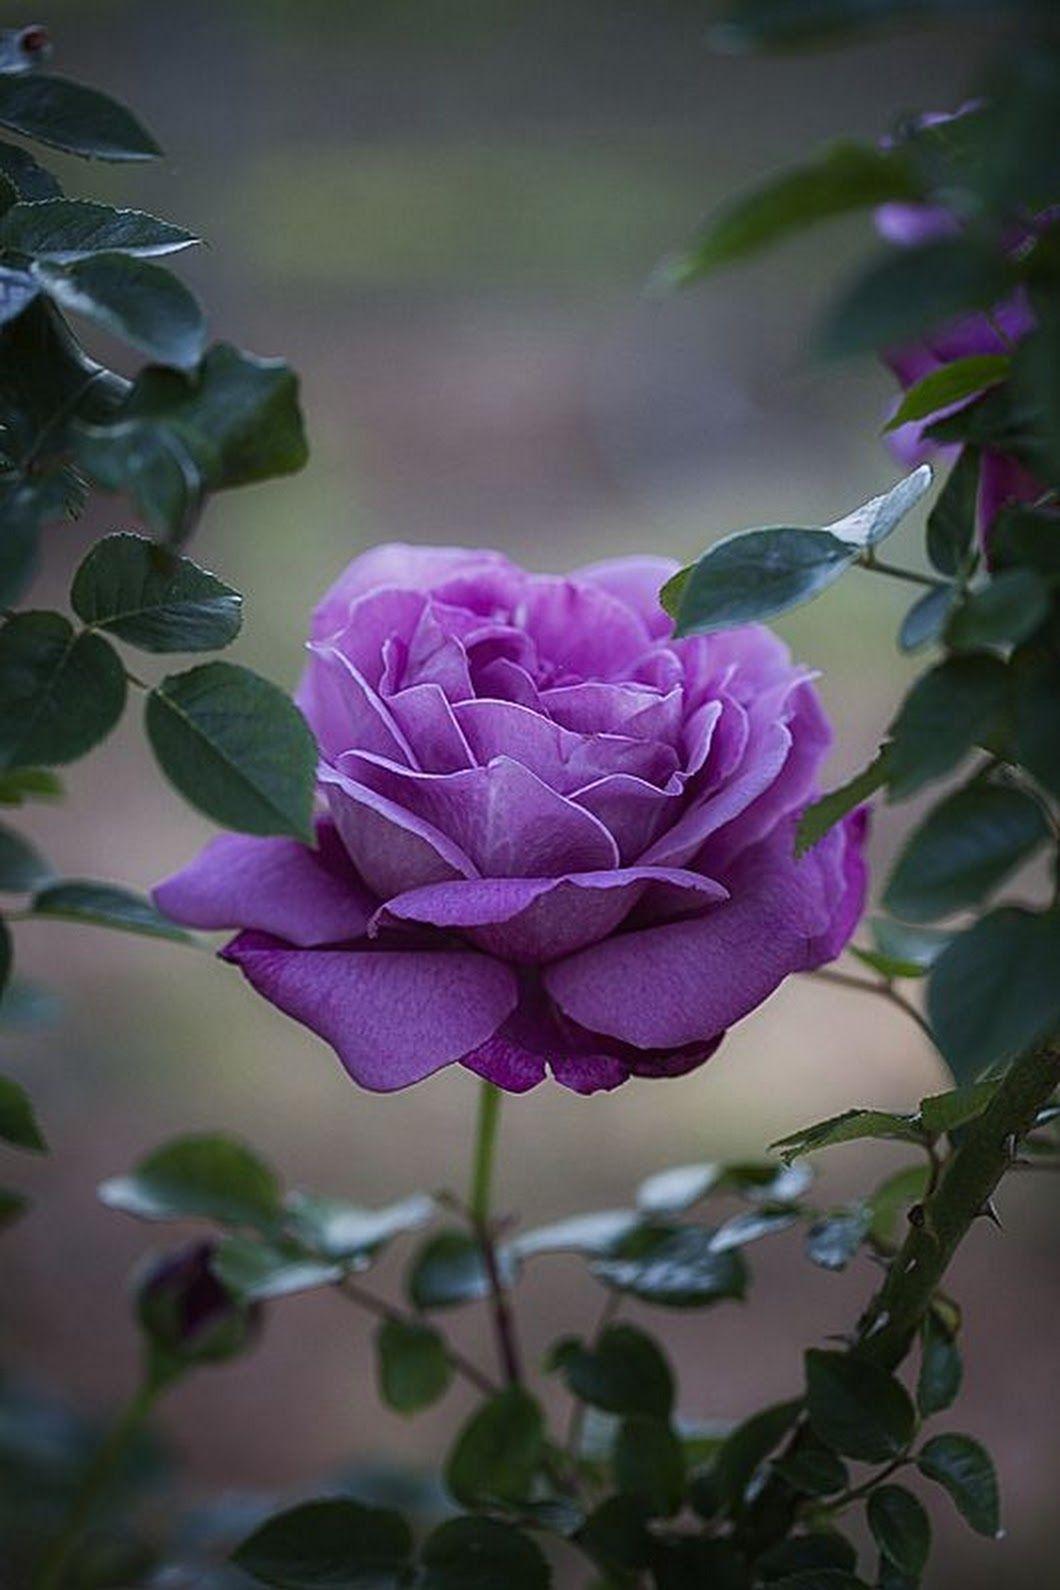 flores roses pinterest flowers beautiful flowers flores purple roses lavender roses purple lilac lavander beautiful roses izmirmasajfo